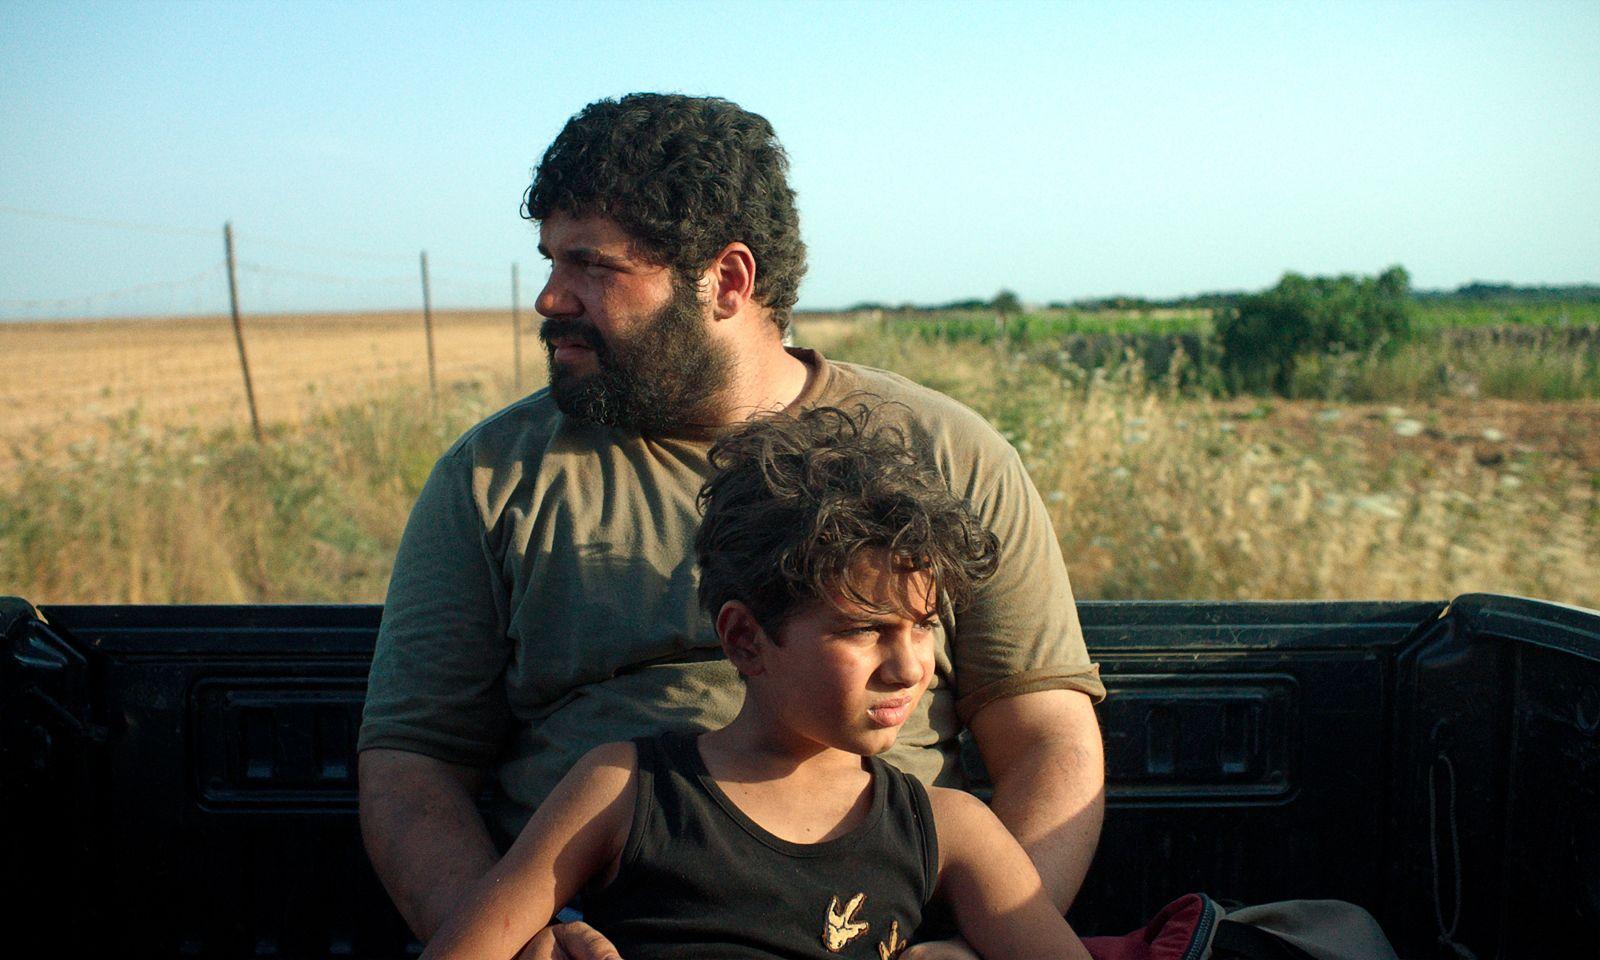 Una Promessa (BANDE-ANNONCE) de Gianluca et Massimiliano De Serio - Le 14 octobre 2020 au cinéma